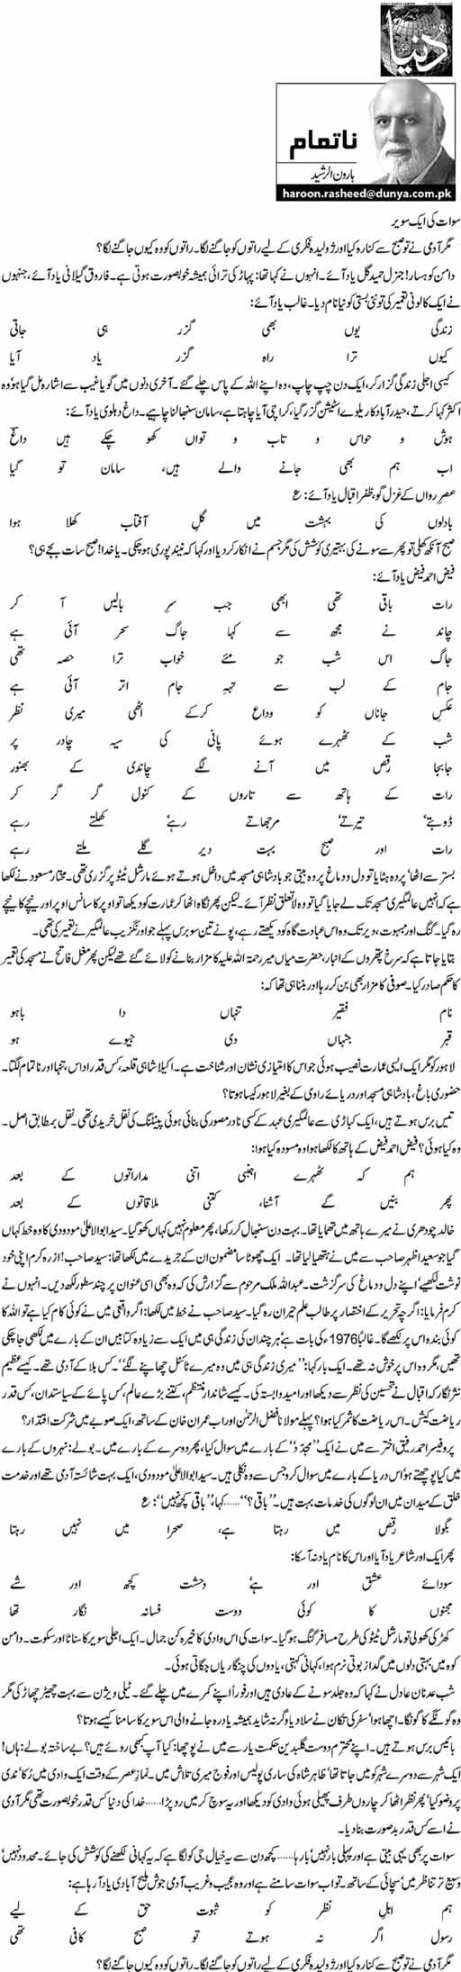 Sawat Ki Aik Sawer - Haroon ur Rasheed